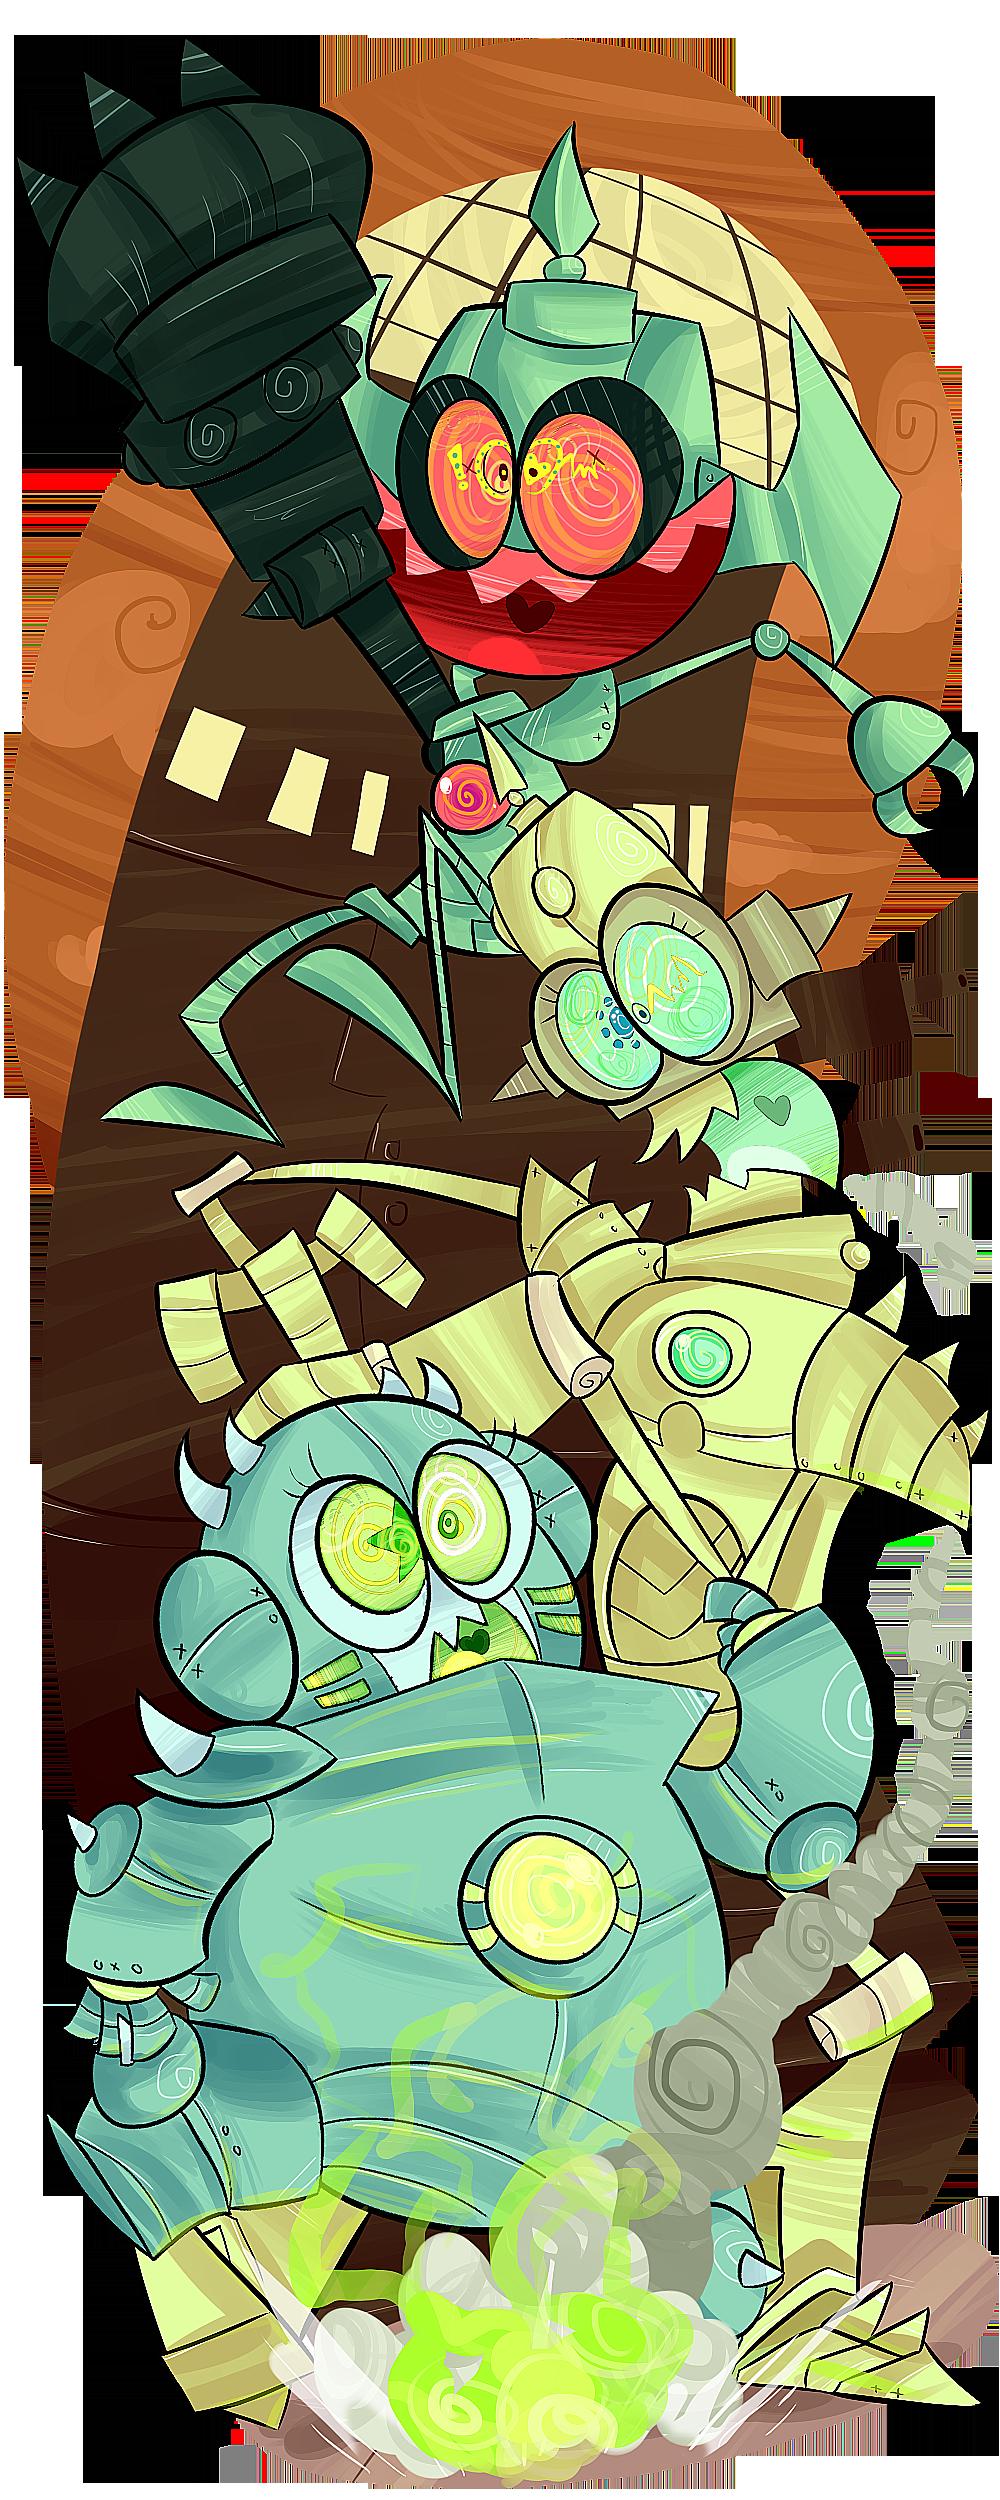 ROBOTOMY! by KrystalFleming